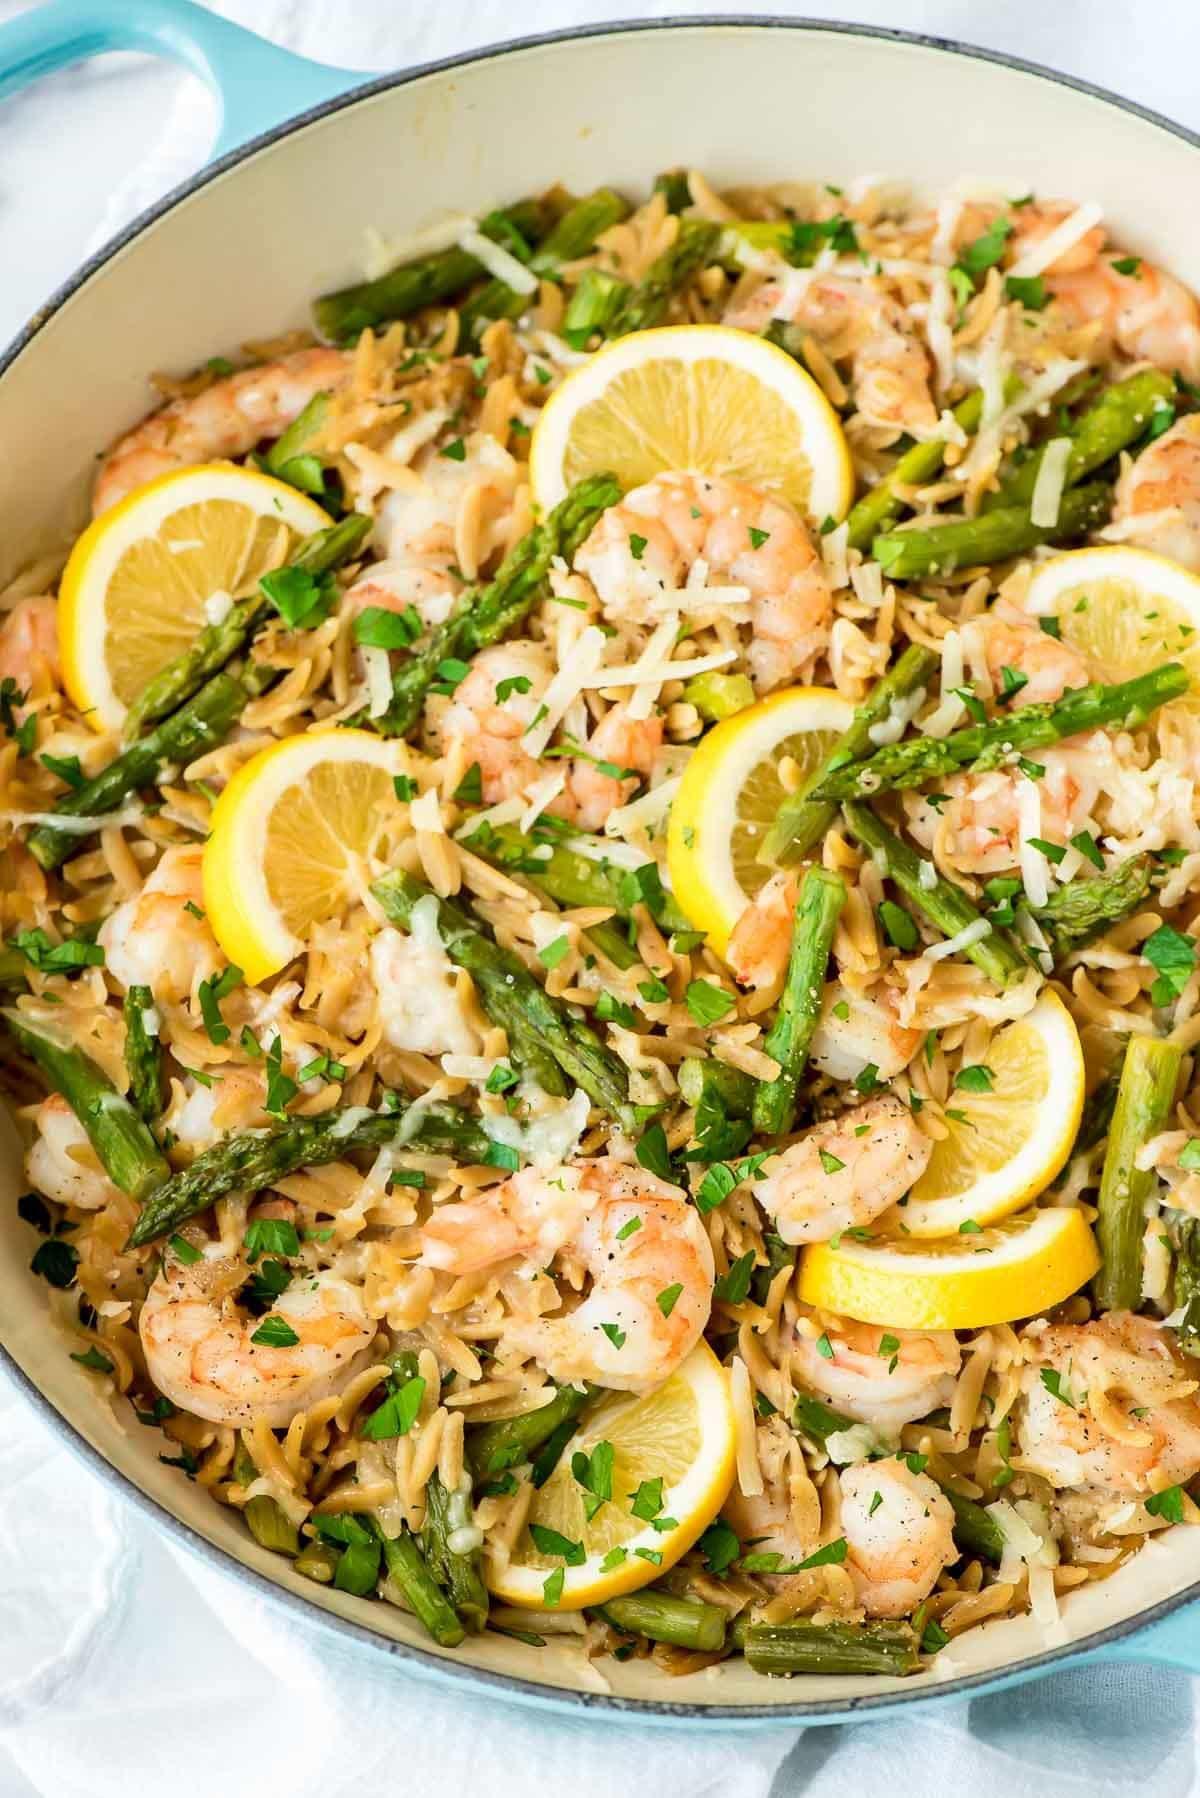 Shrimp Recipes With Pasta  Lemon Shrimp Pasta with Orzo and Asparagus